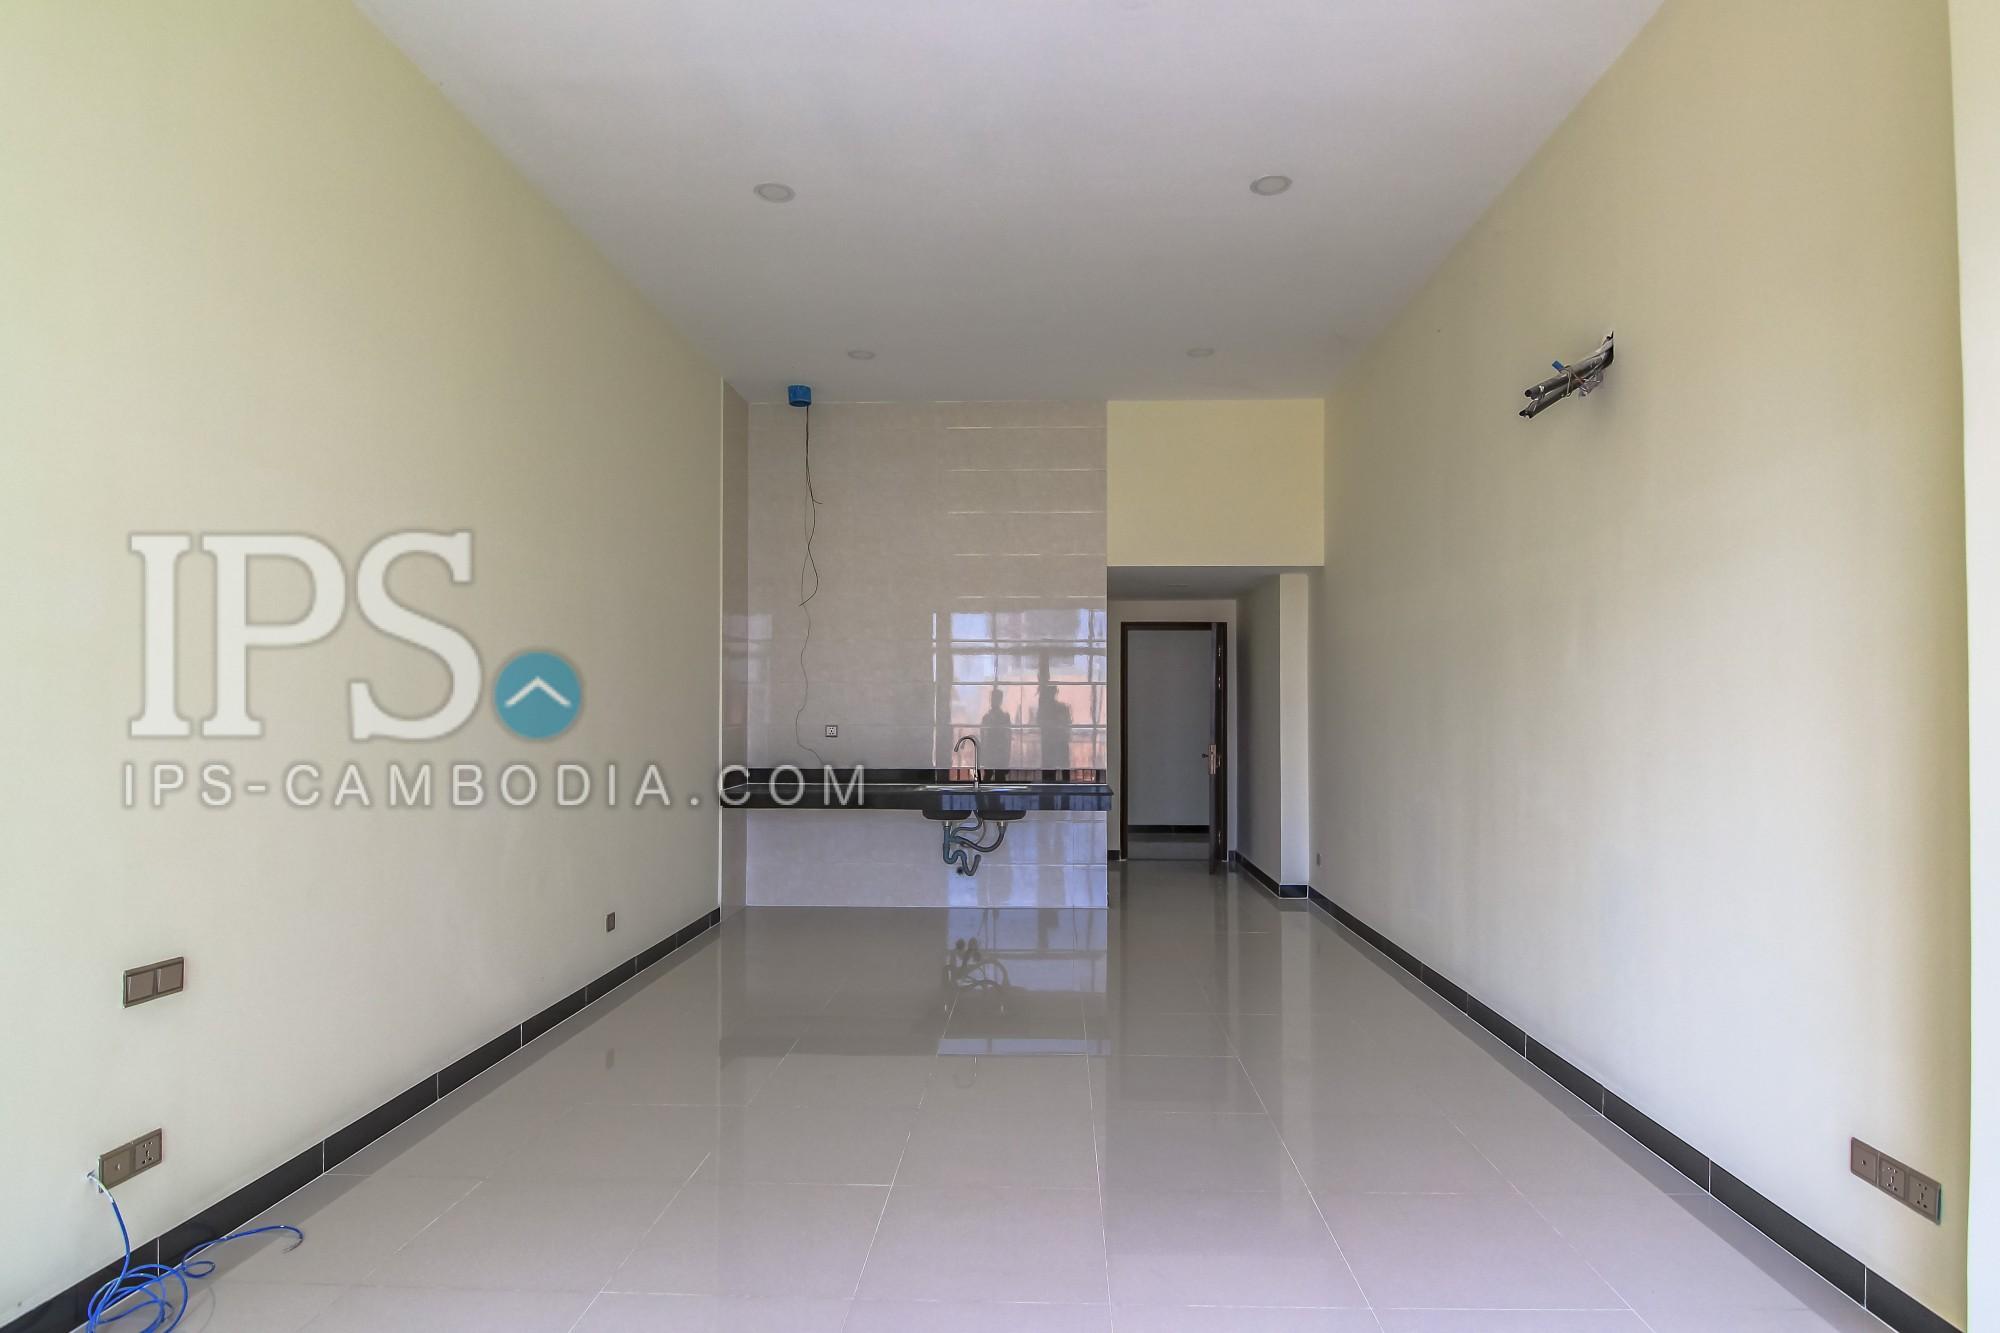 12 Rooms Shophouse for Rent - 7 Makara, Phnom Penh